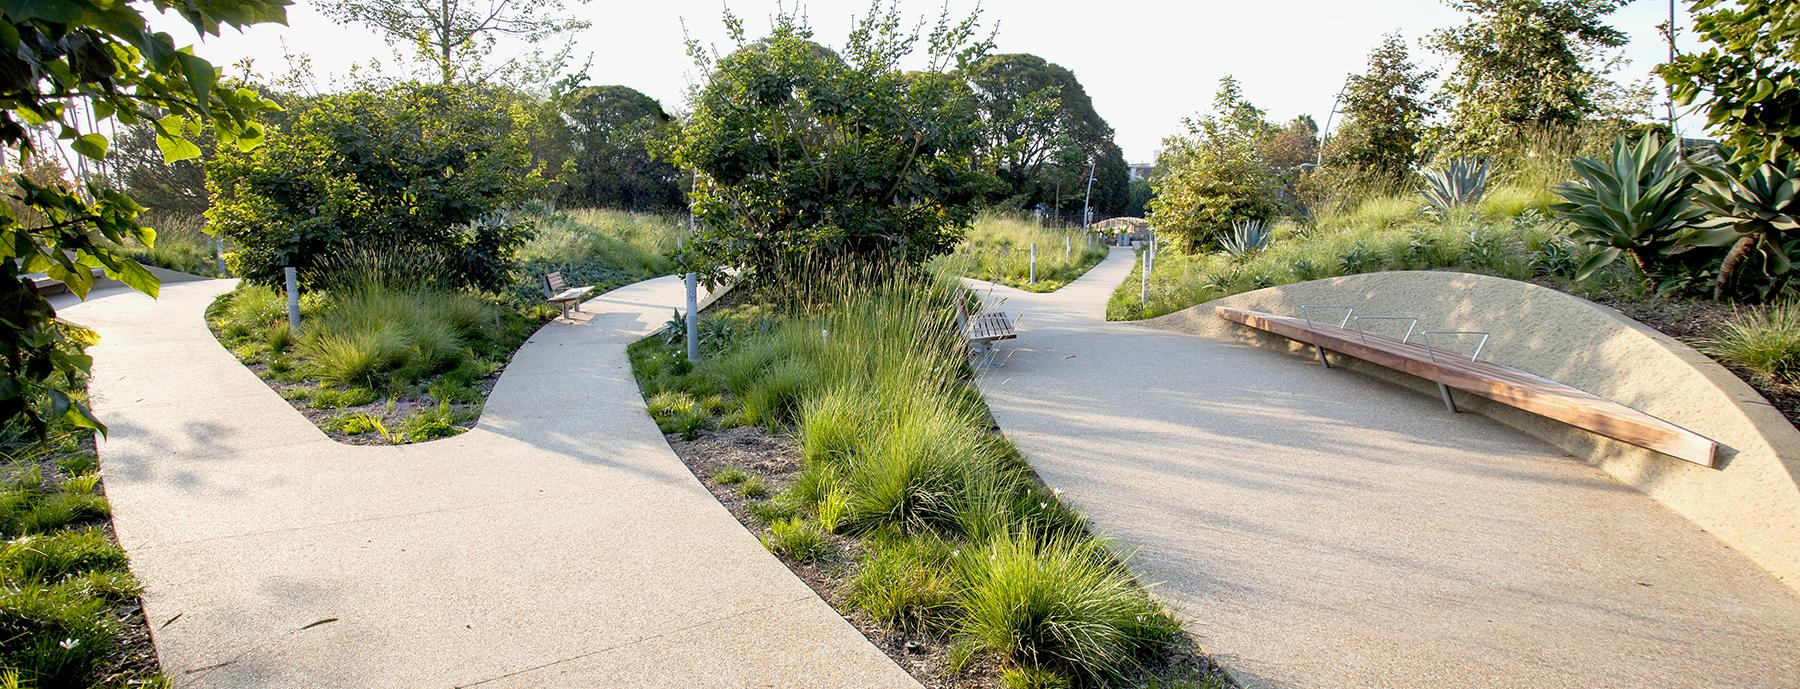 Tongva Park